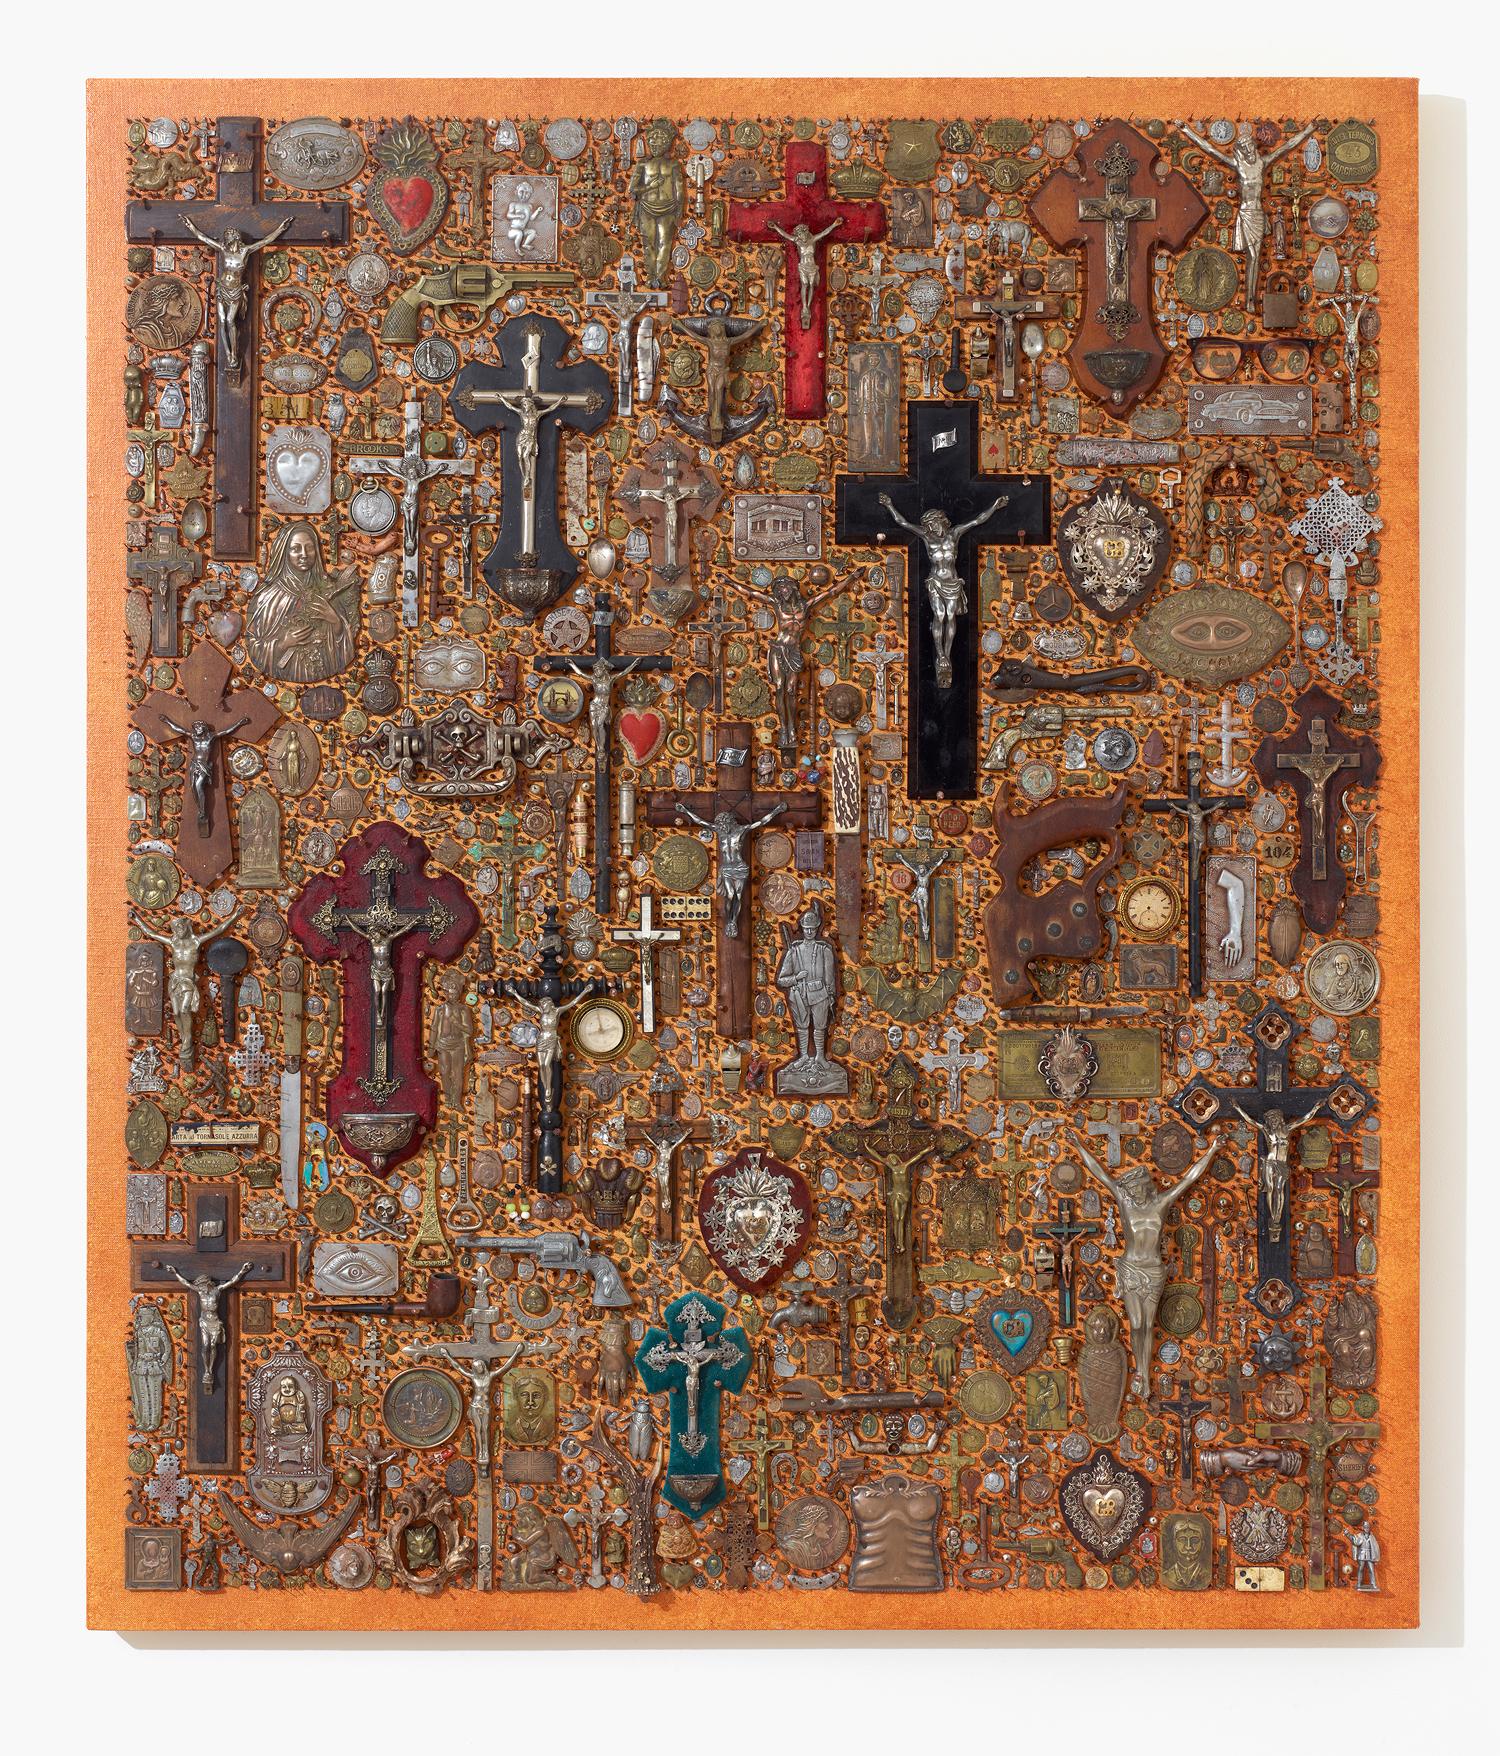 Artifact Board with Crucifix